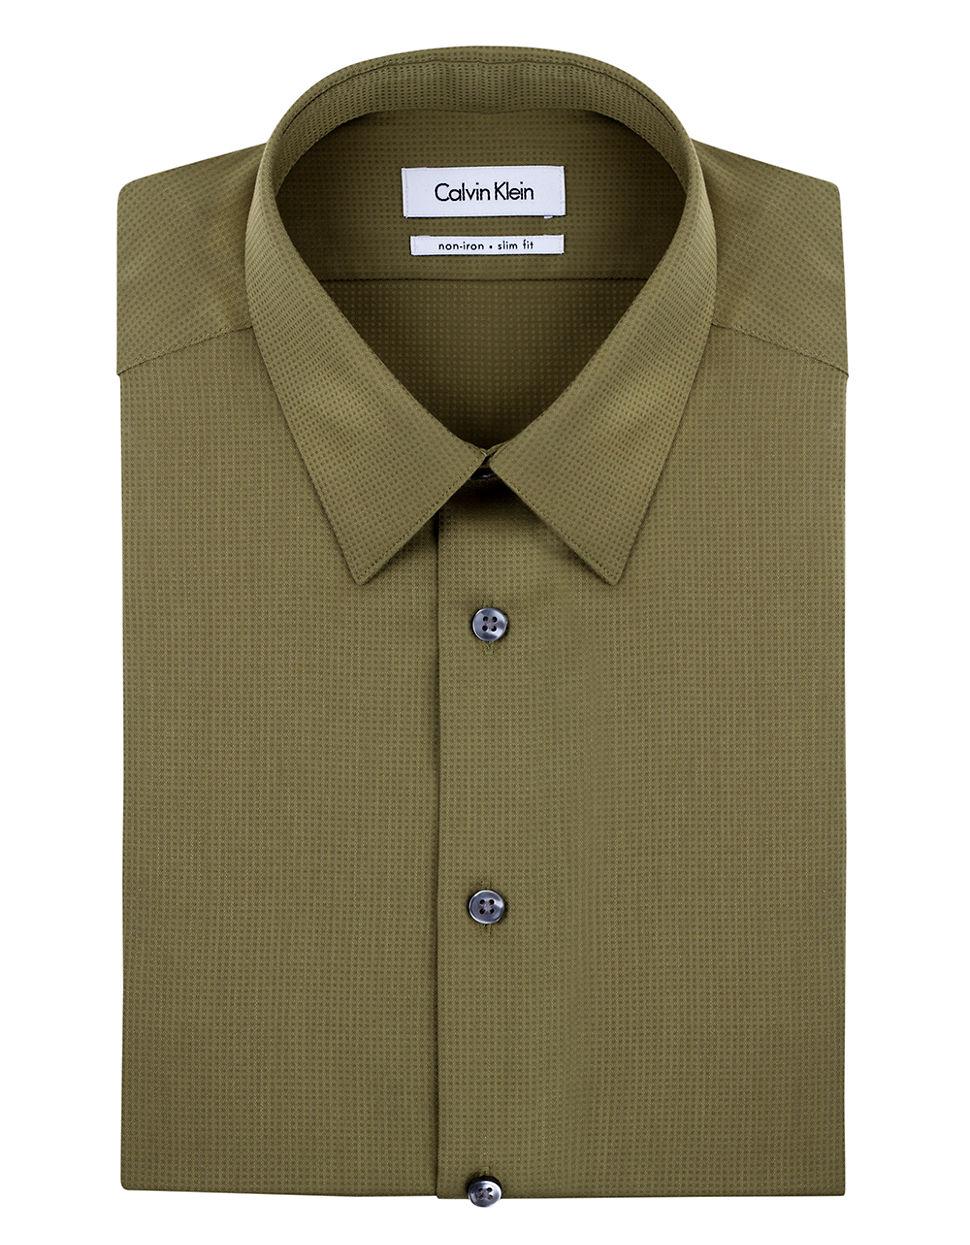 Calvin Klein Textured Stripe Dress Shirt In Green For Men